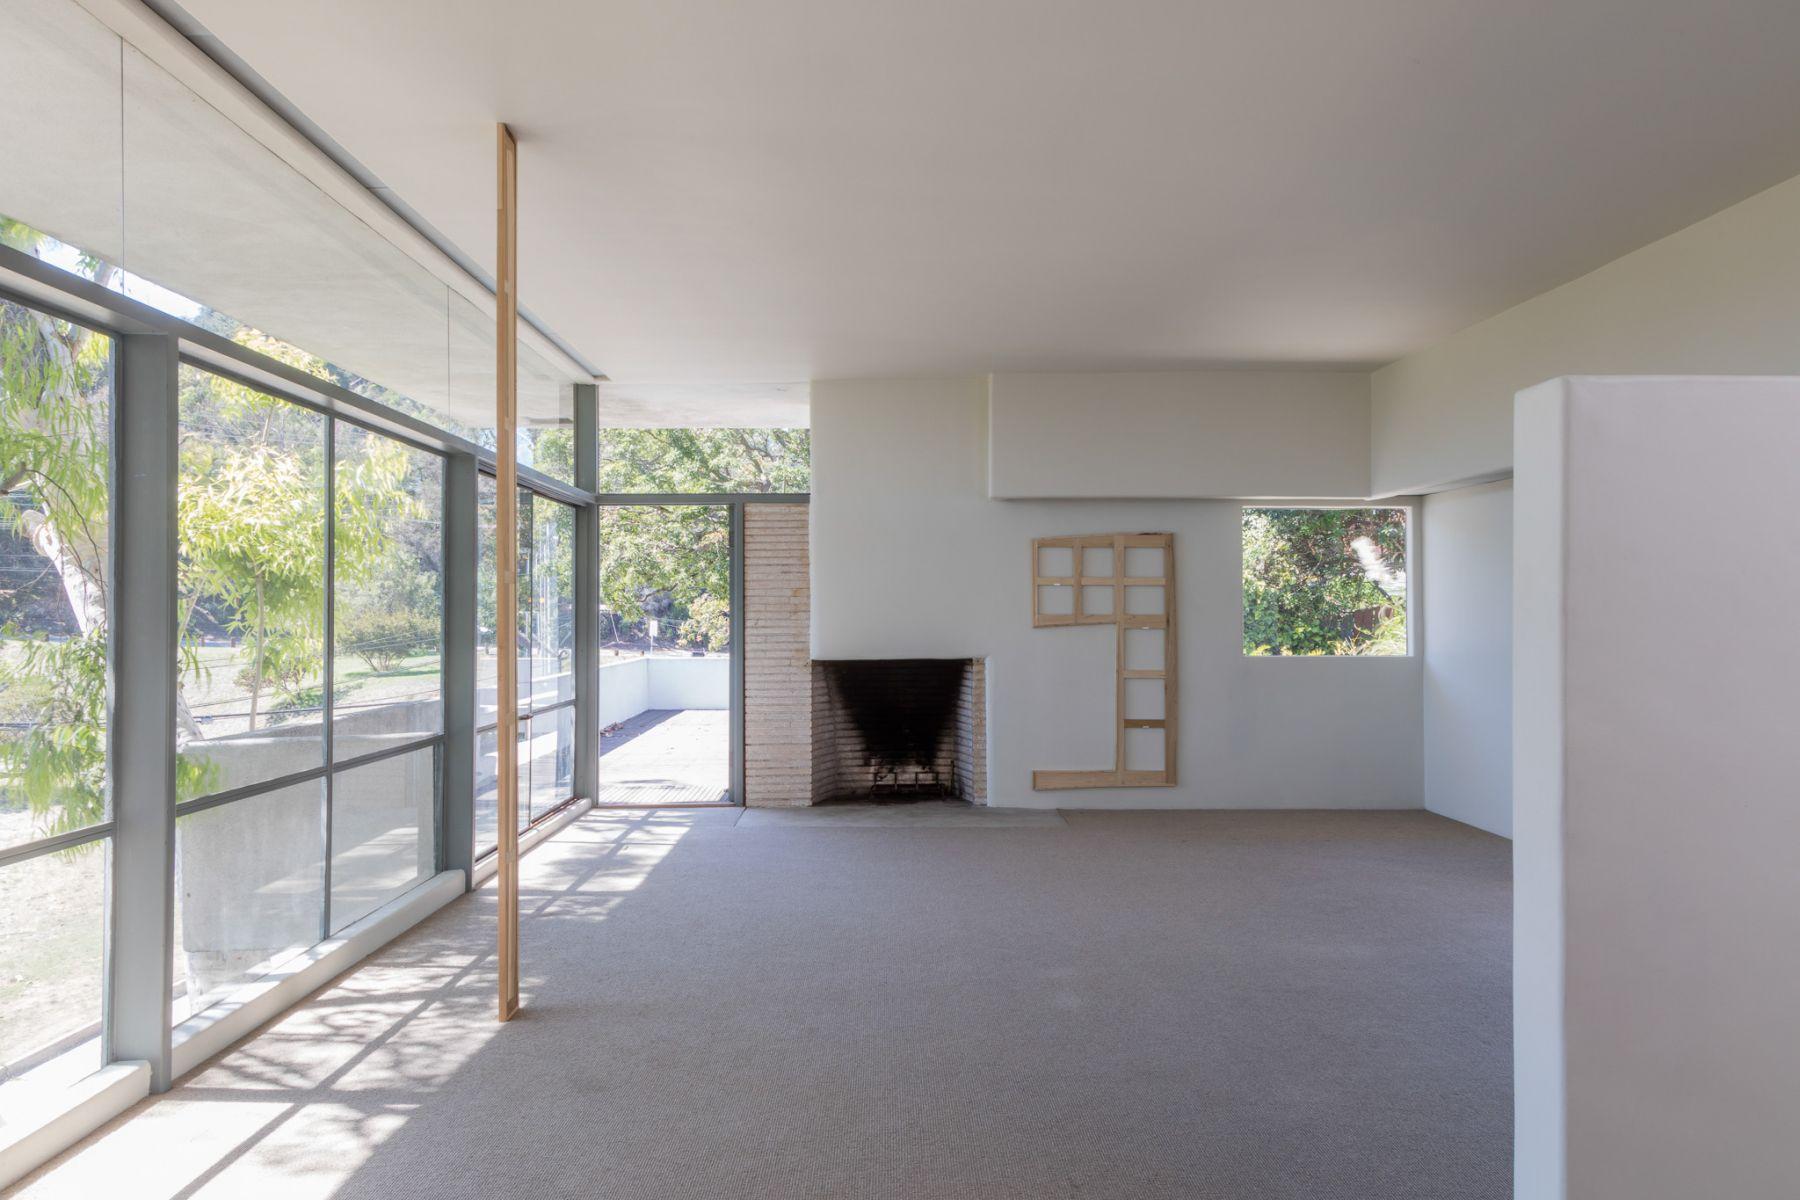 Jacob Kassay, Installation view: Fitzpatrick-Leland House September, 2015